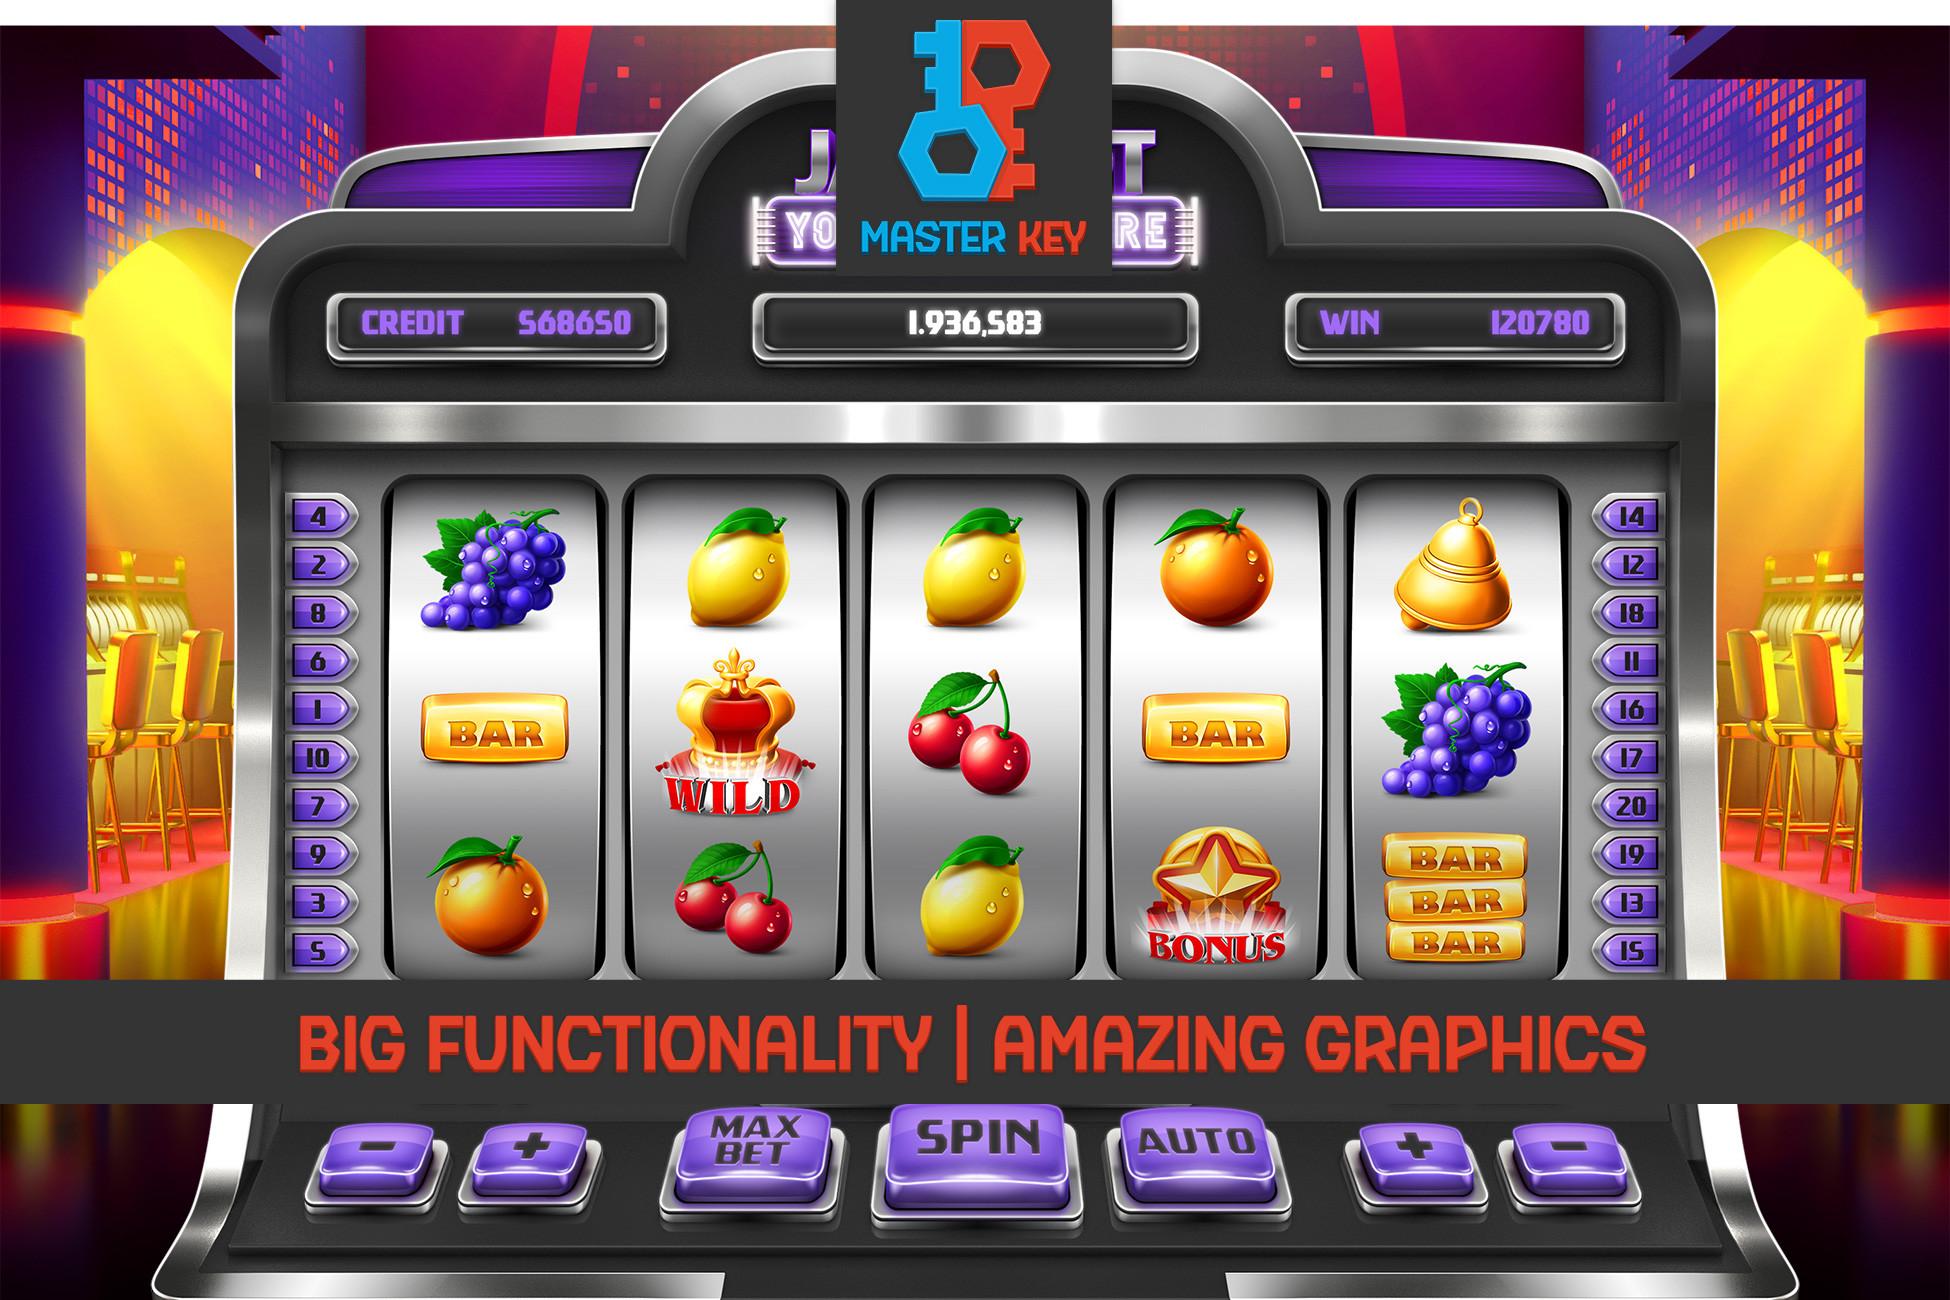 gta online slot machine jackpot